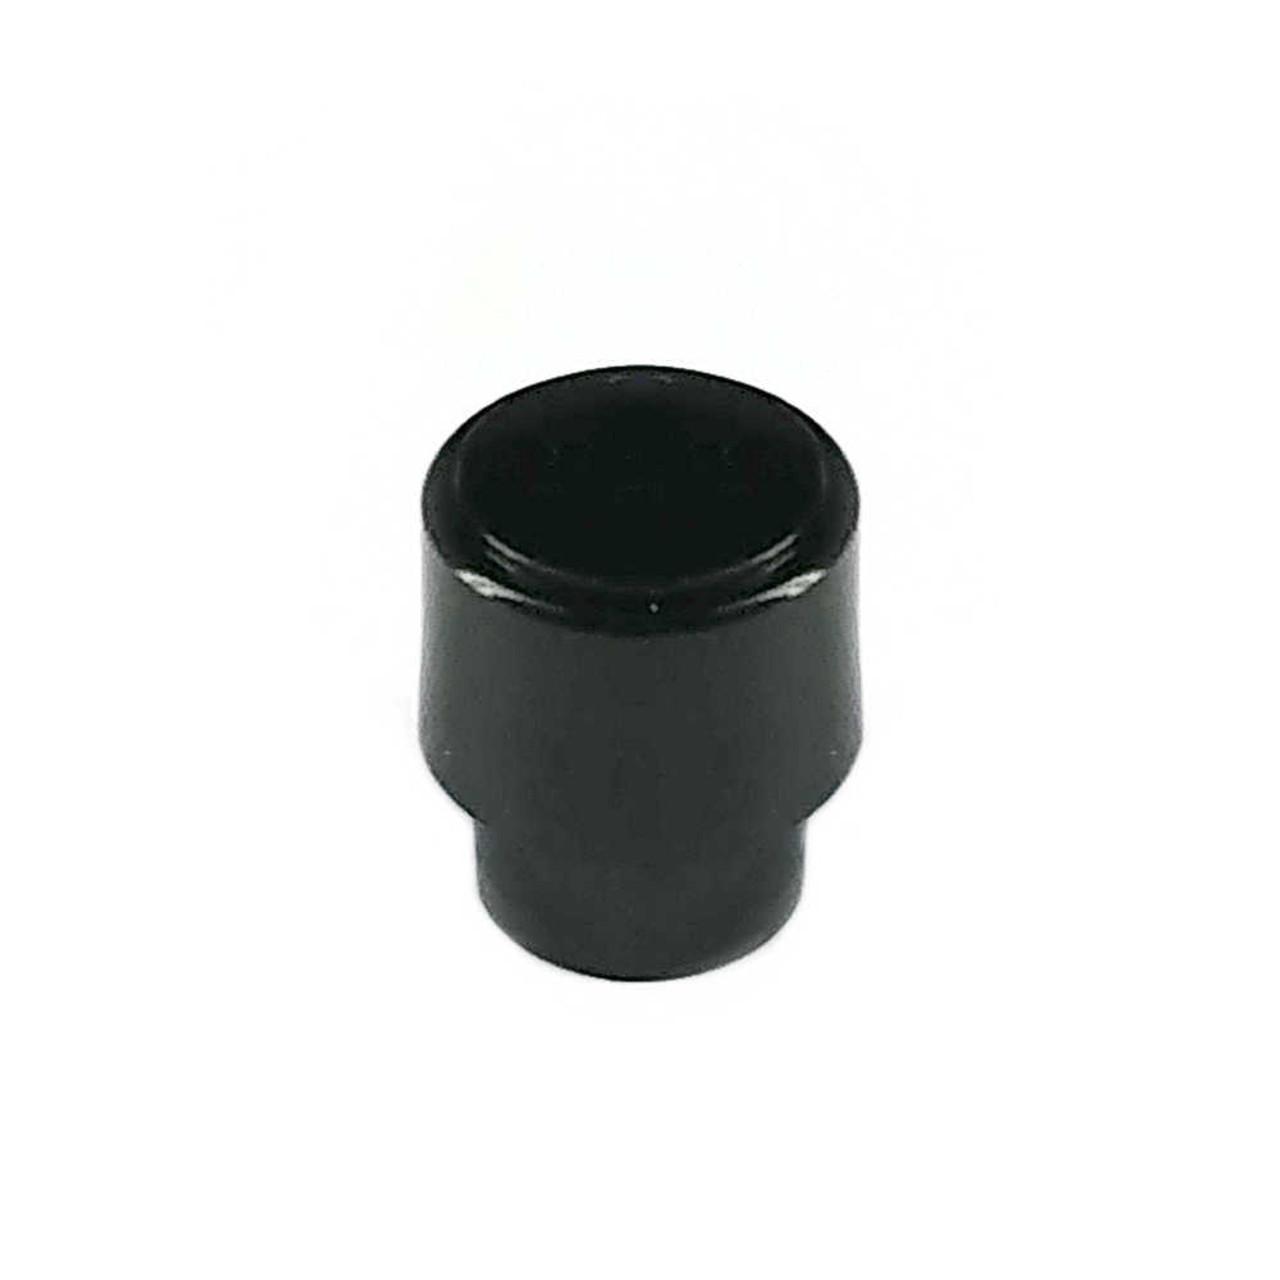 Barrel Switch Tip - Black